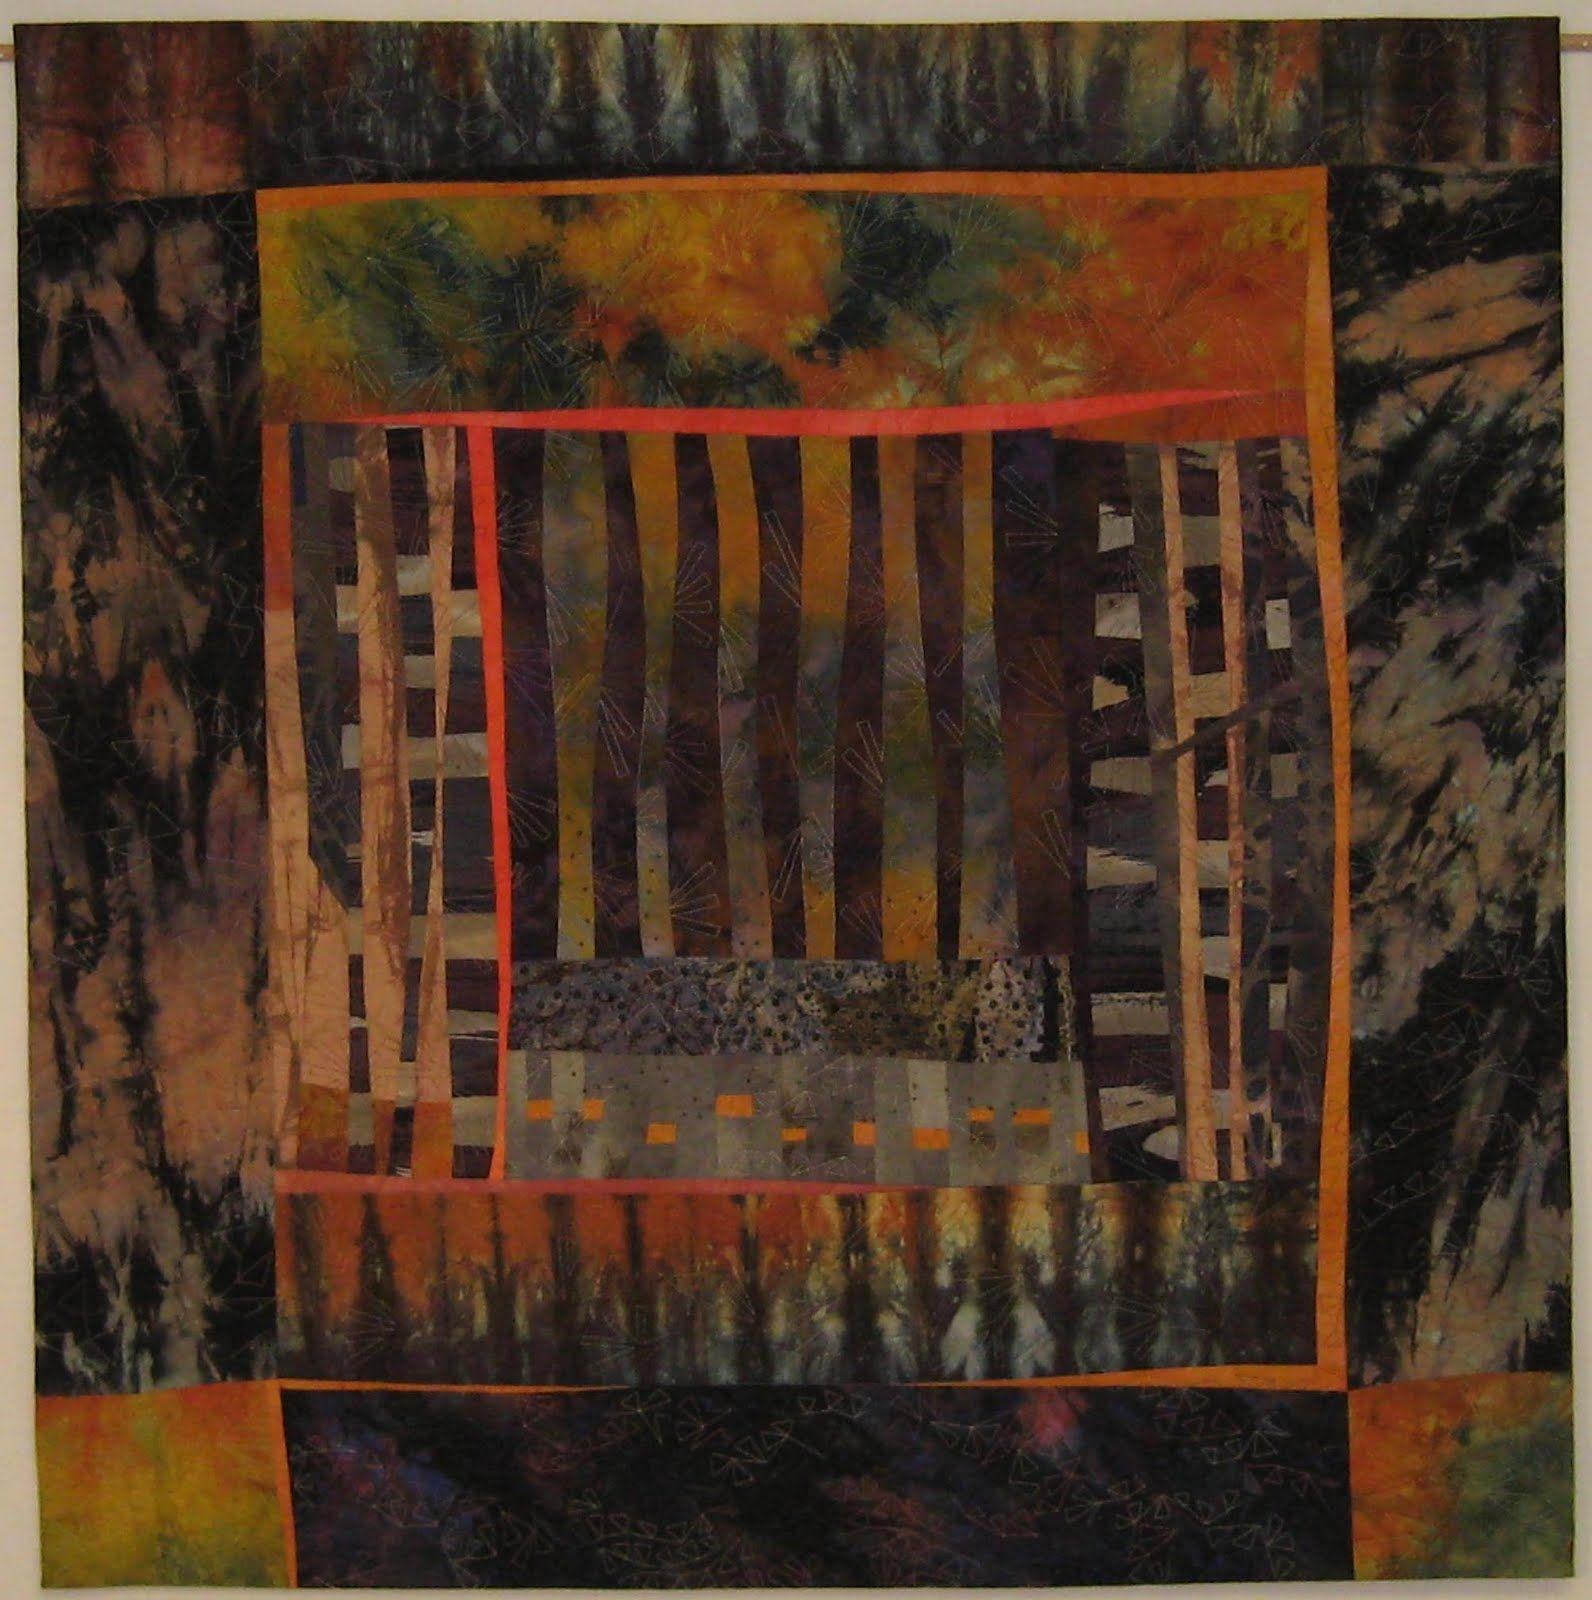 The Textile Blog: Helene Davis and Hand Dyed Artwork